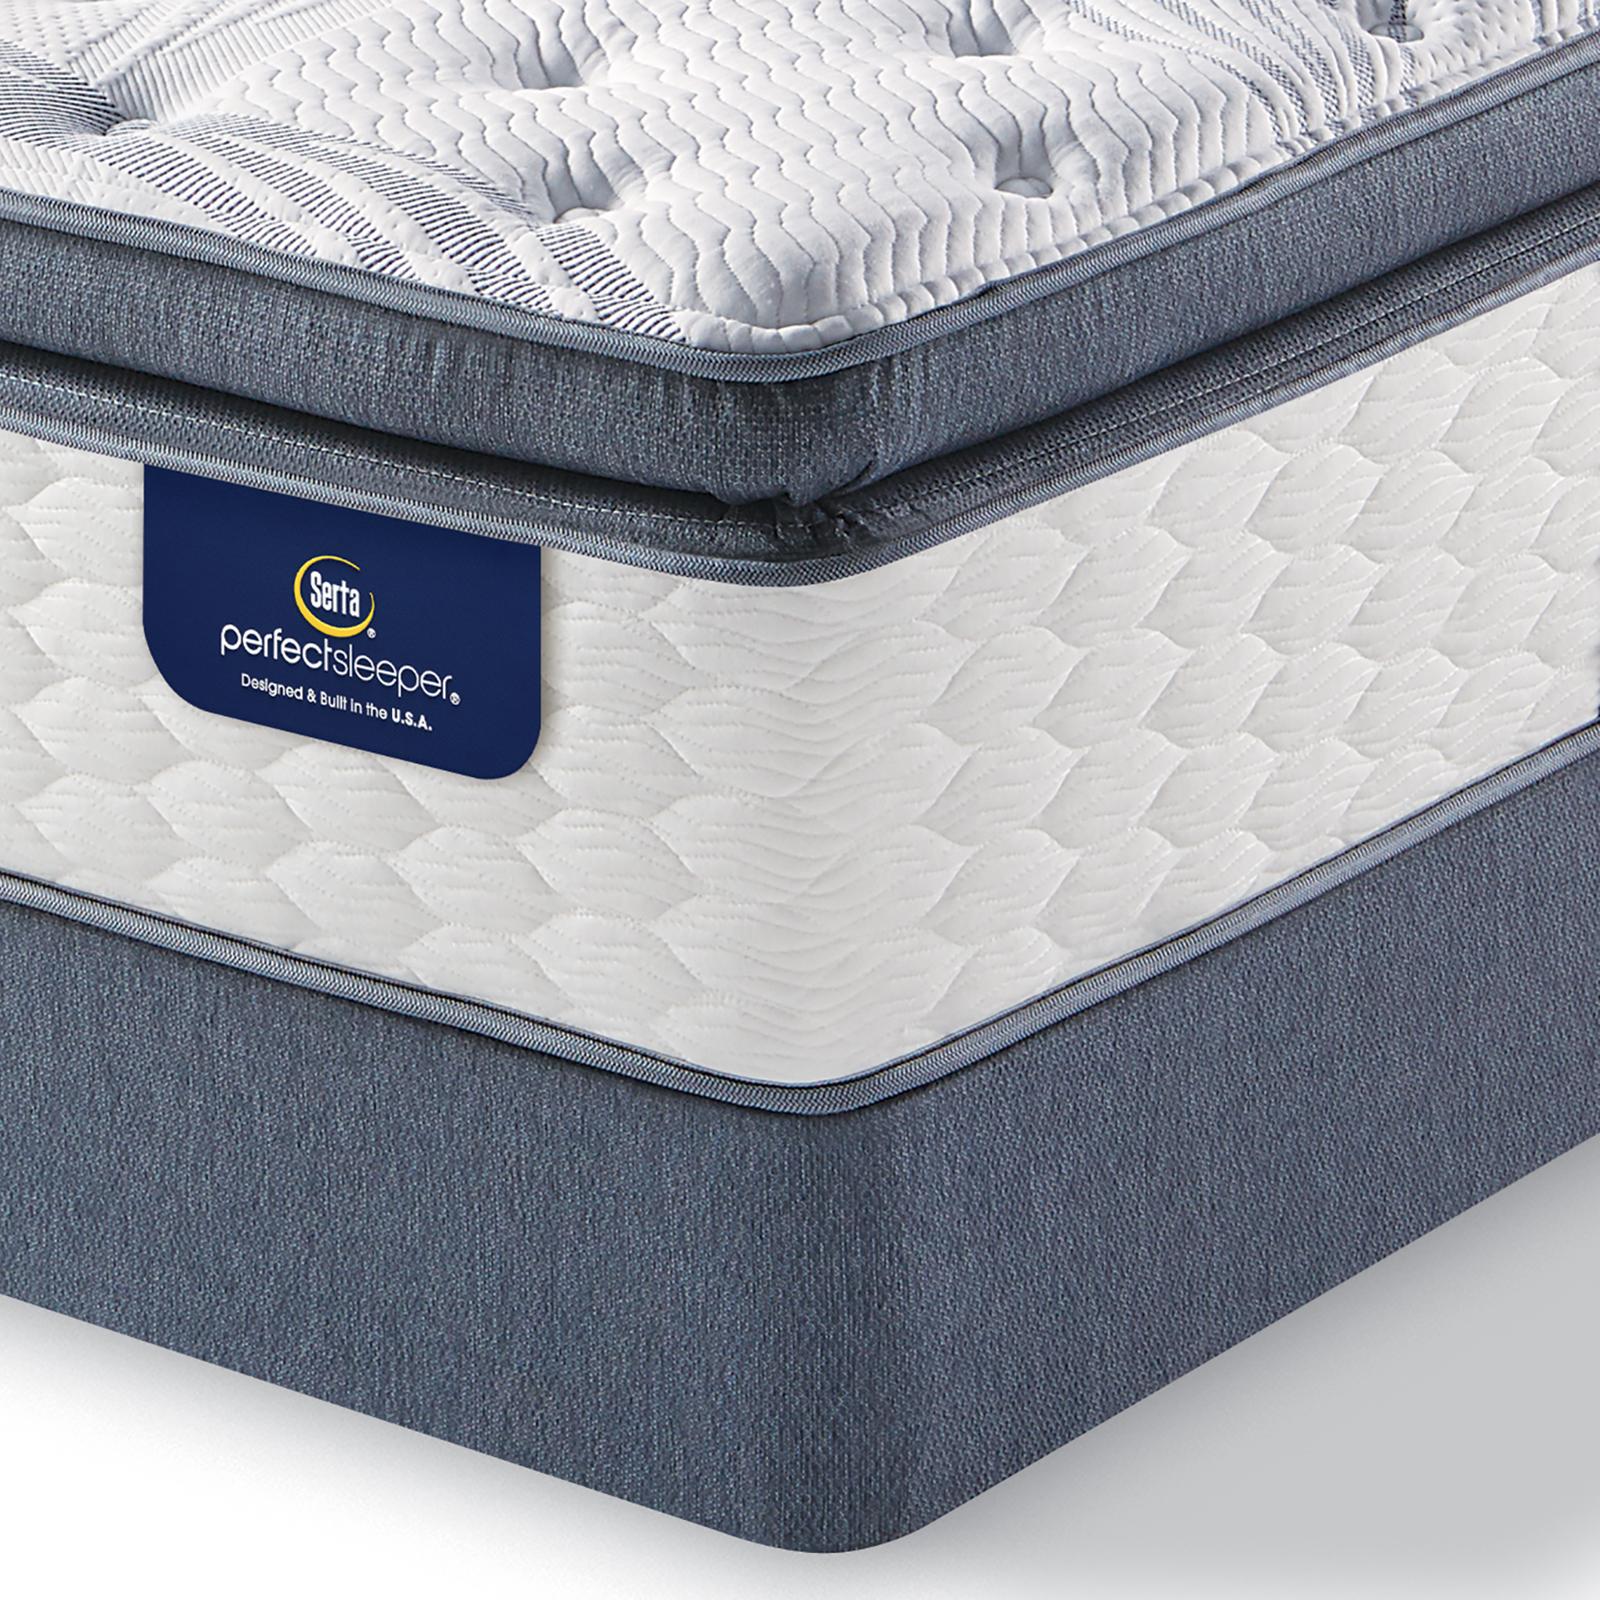 serta perfect sleeper walworth plush super pillowtop